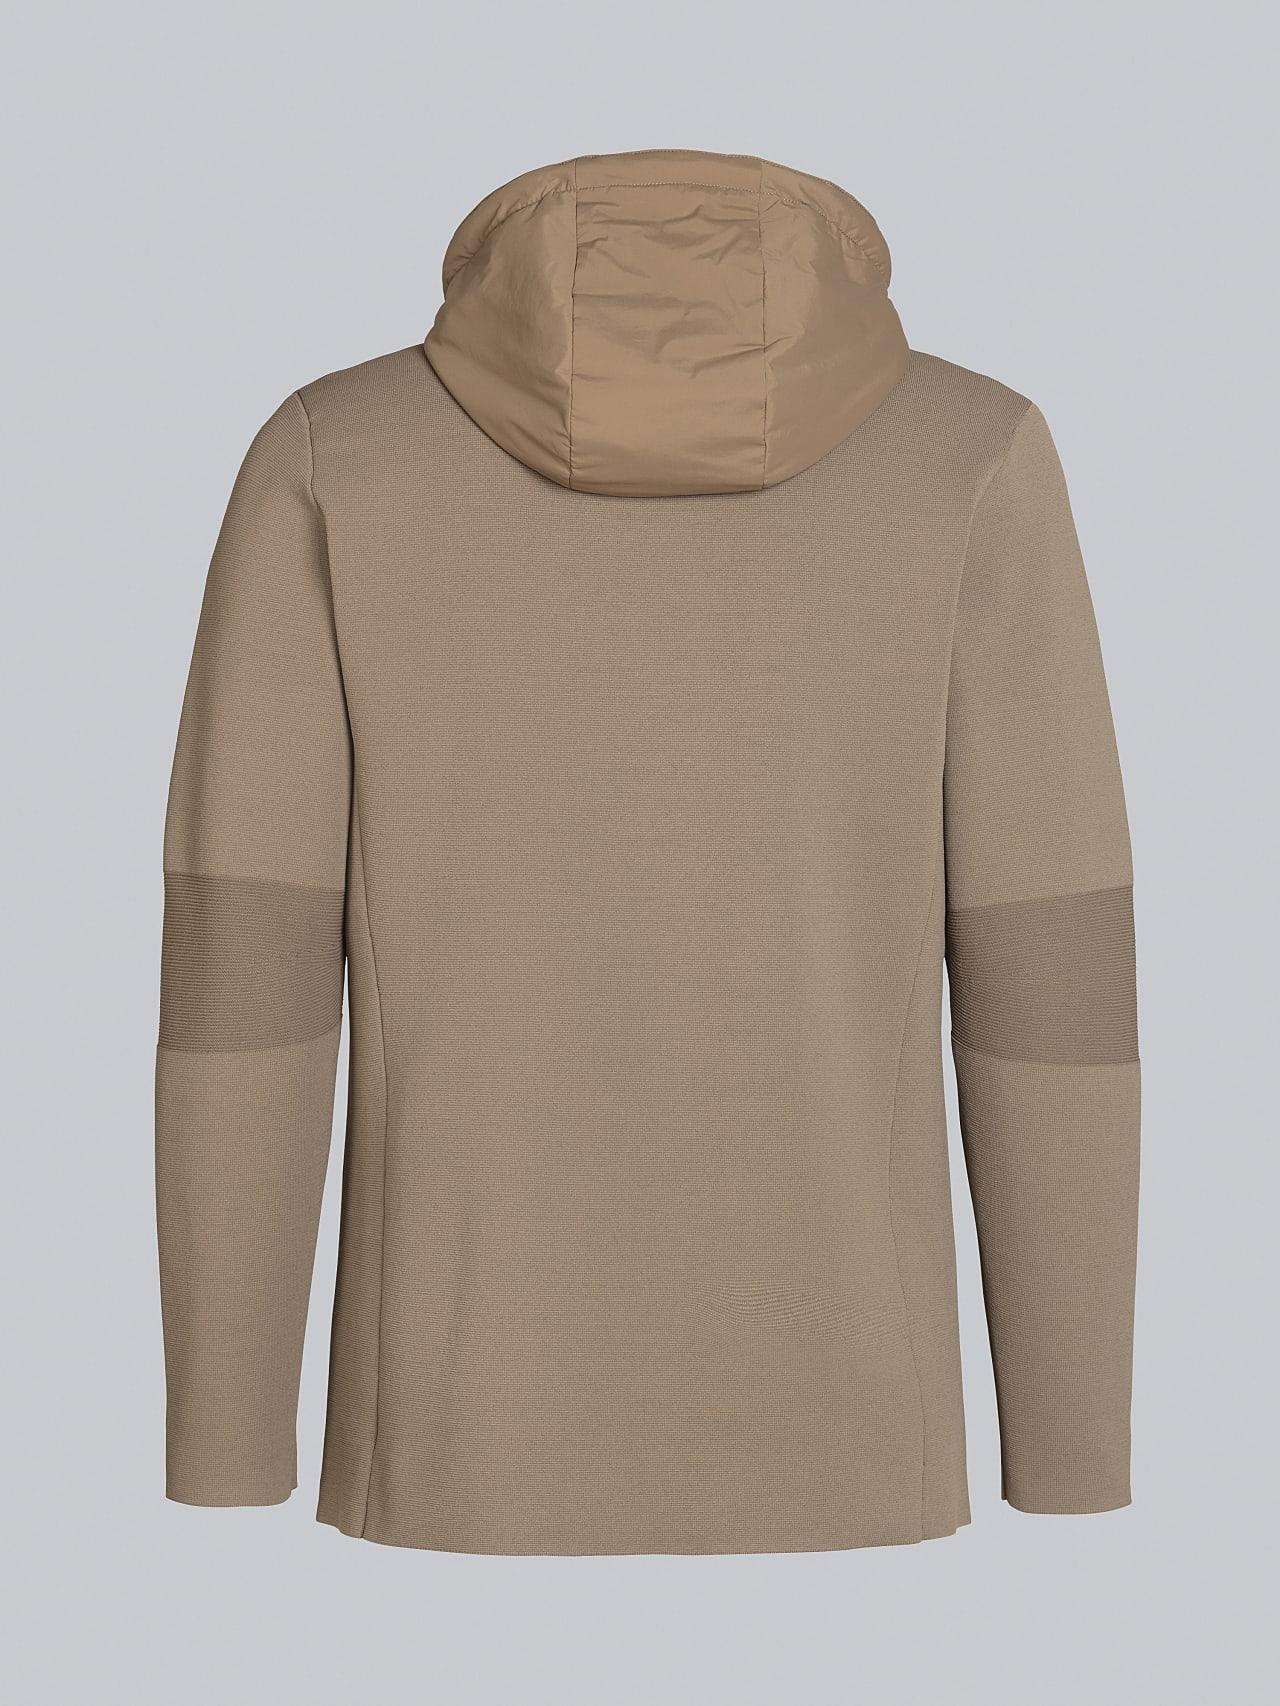 FELIP V1.Y5.02 Water-Repellent Knit Blazer gold Left Alpha Tauri